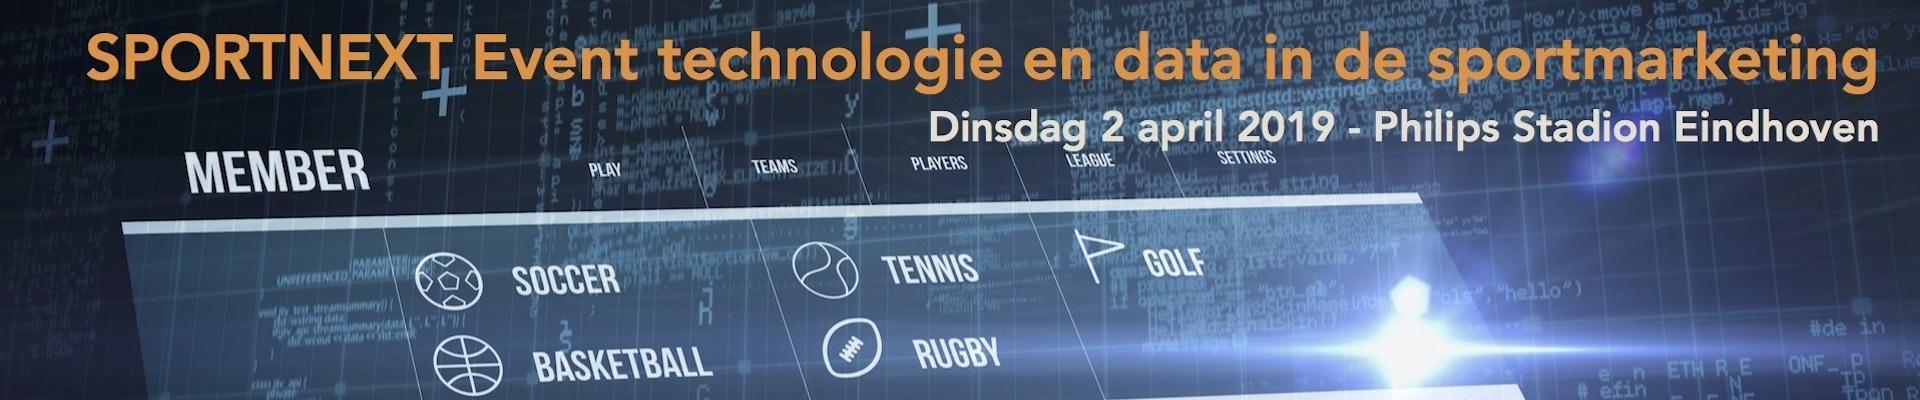 SPORTNEXT Event technologie en data in de sportmarketing